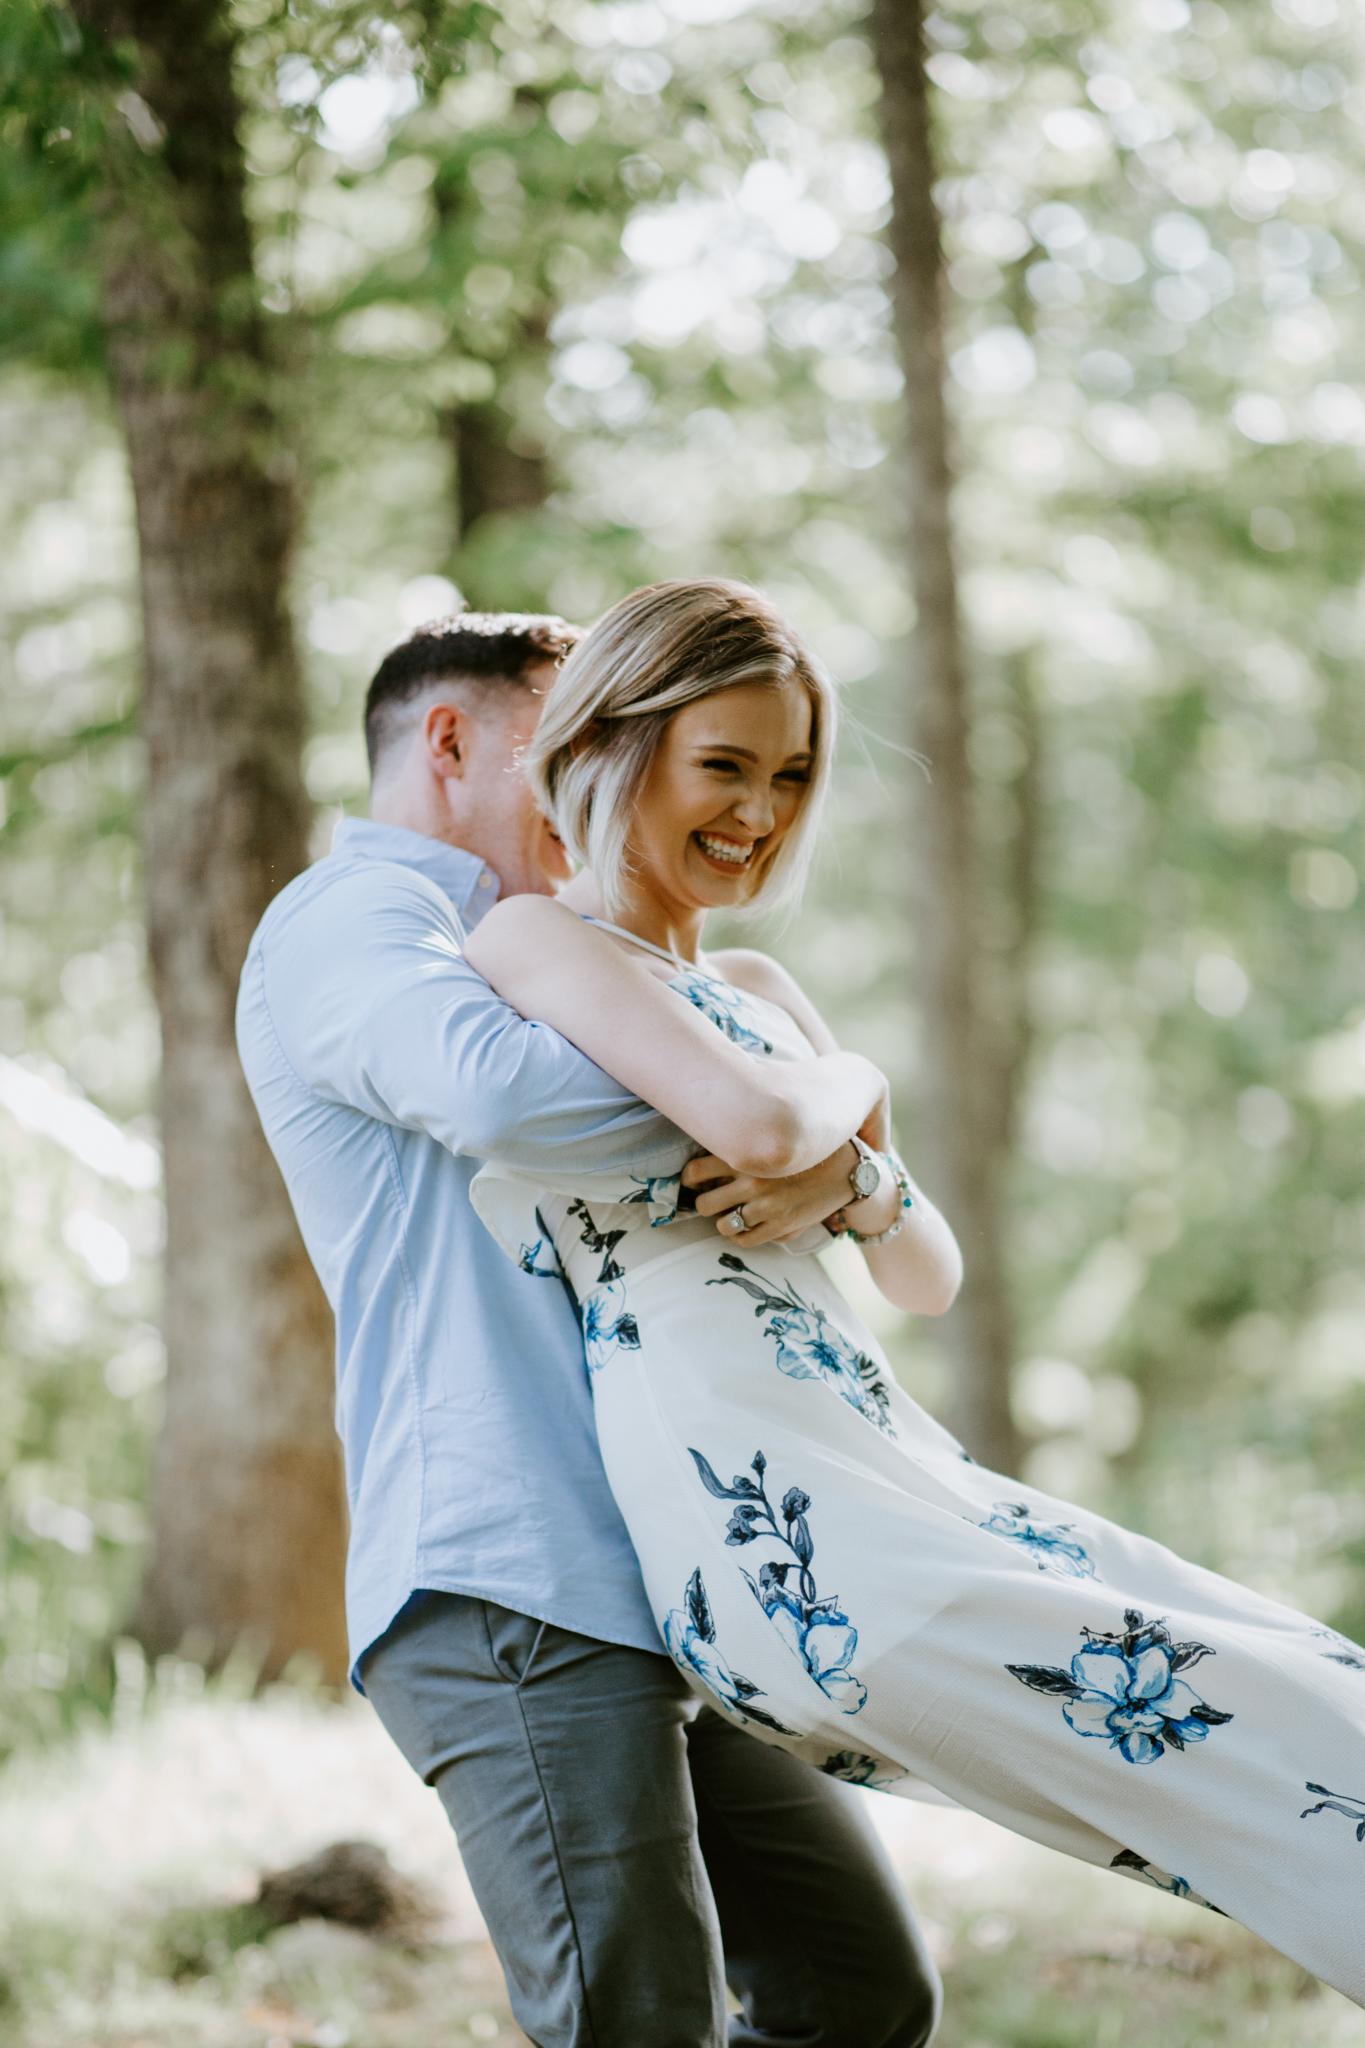 Courtney-Jordan-Chattanooga-Nashville-Tennessee-Wedding-Elopement-Photographer-33.jpg